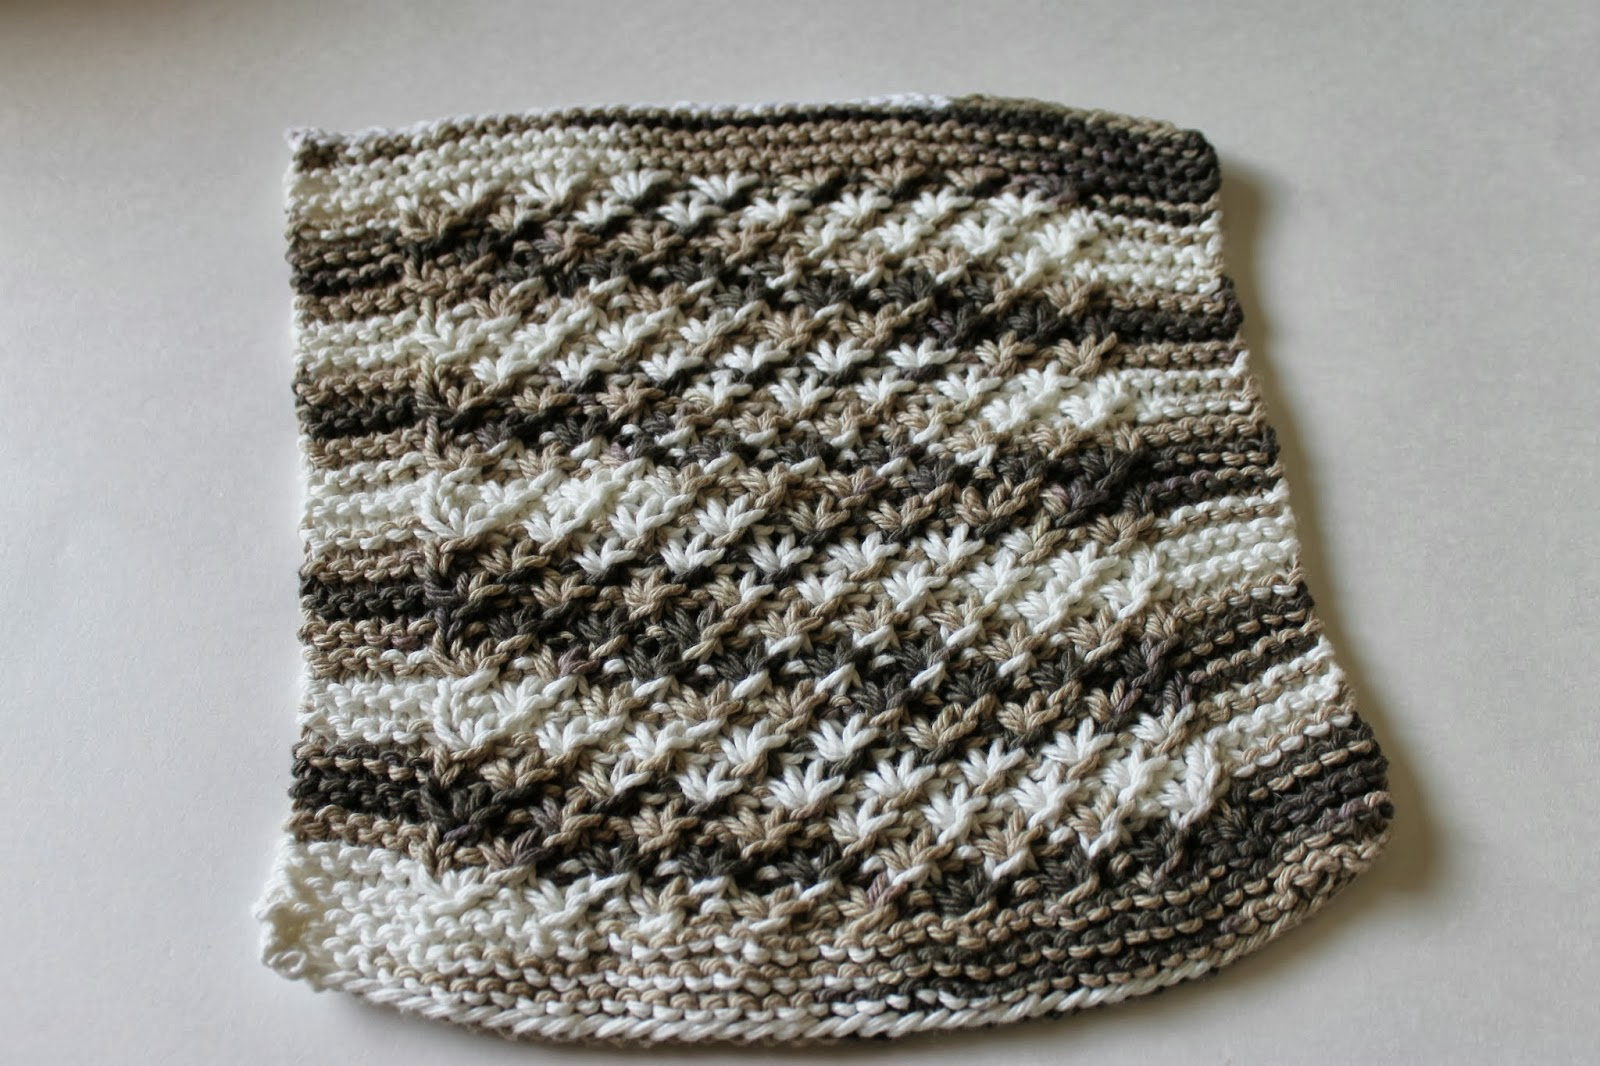 Stay@Home Stitchings: Star Stitch Dishcloth Pattern